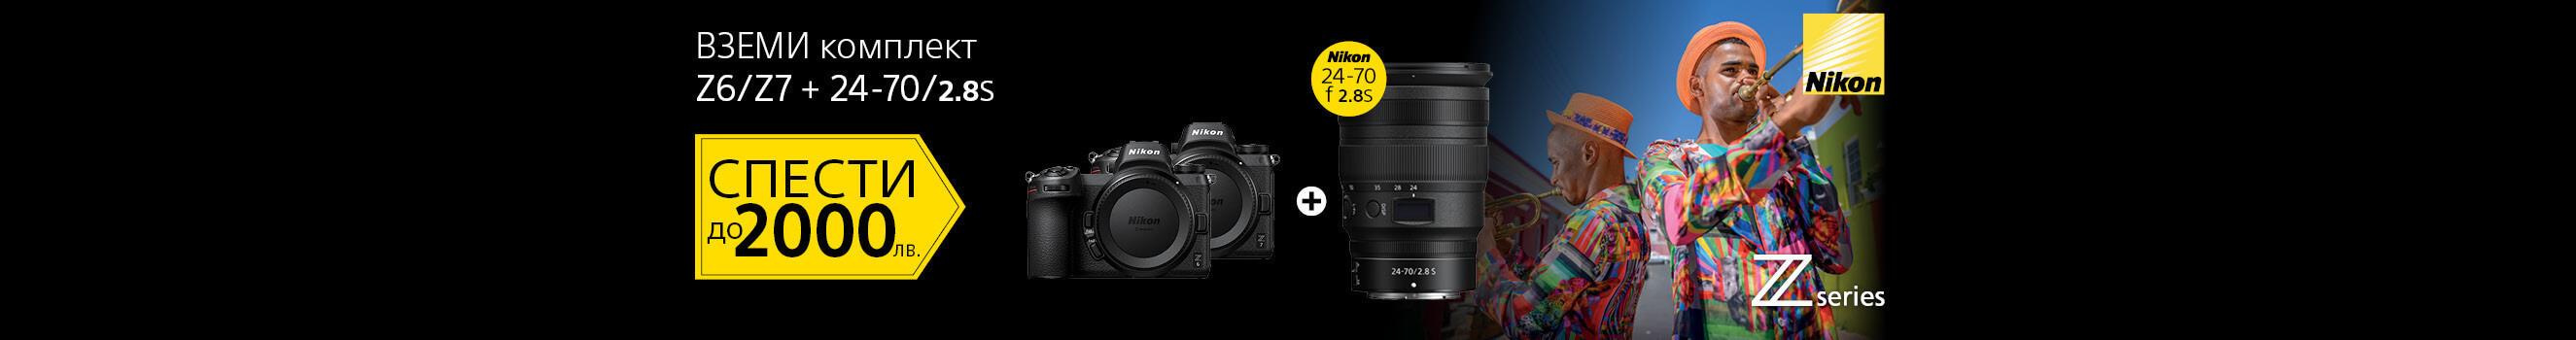 Фотоапарати Nikon Z на промоционална цена